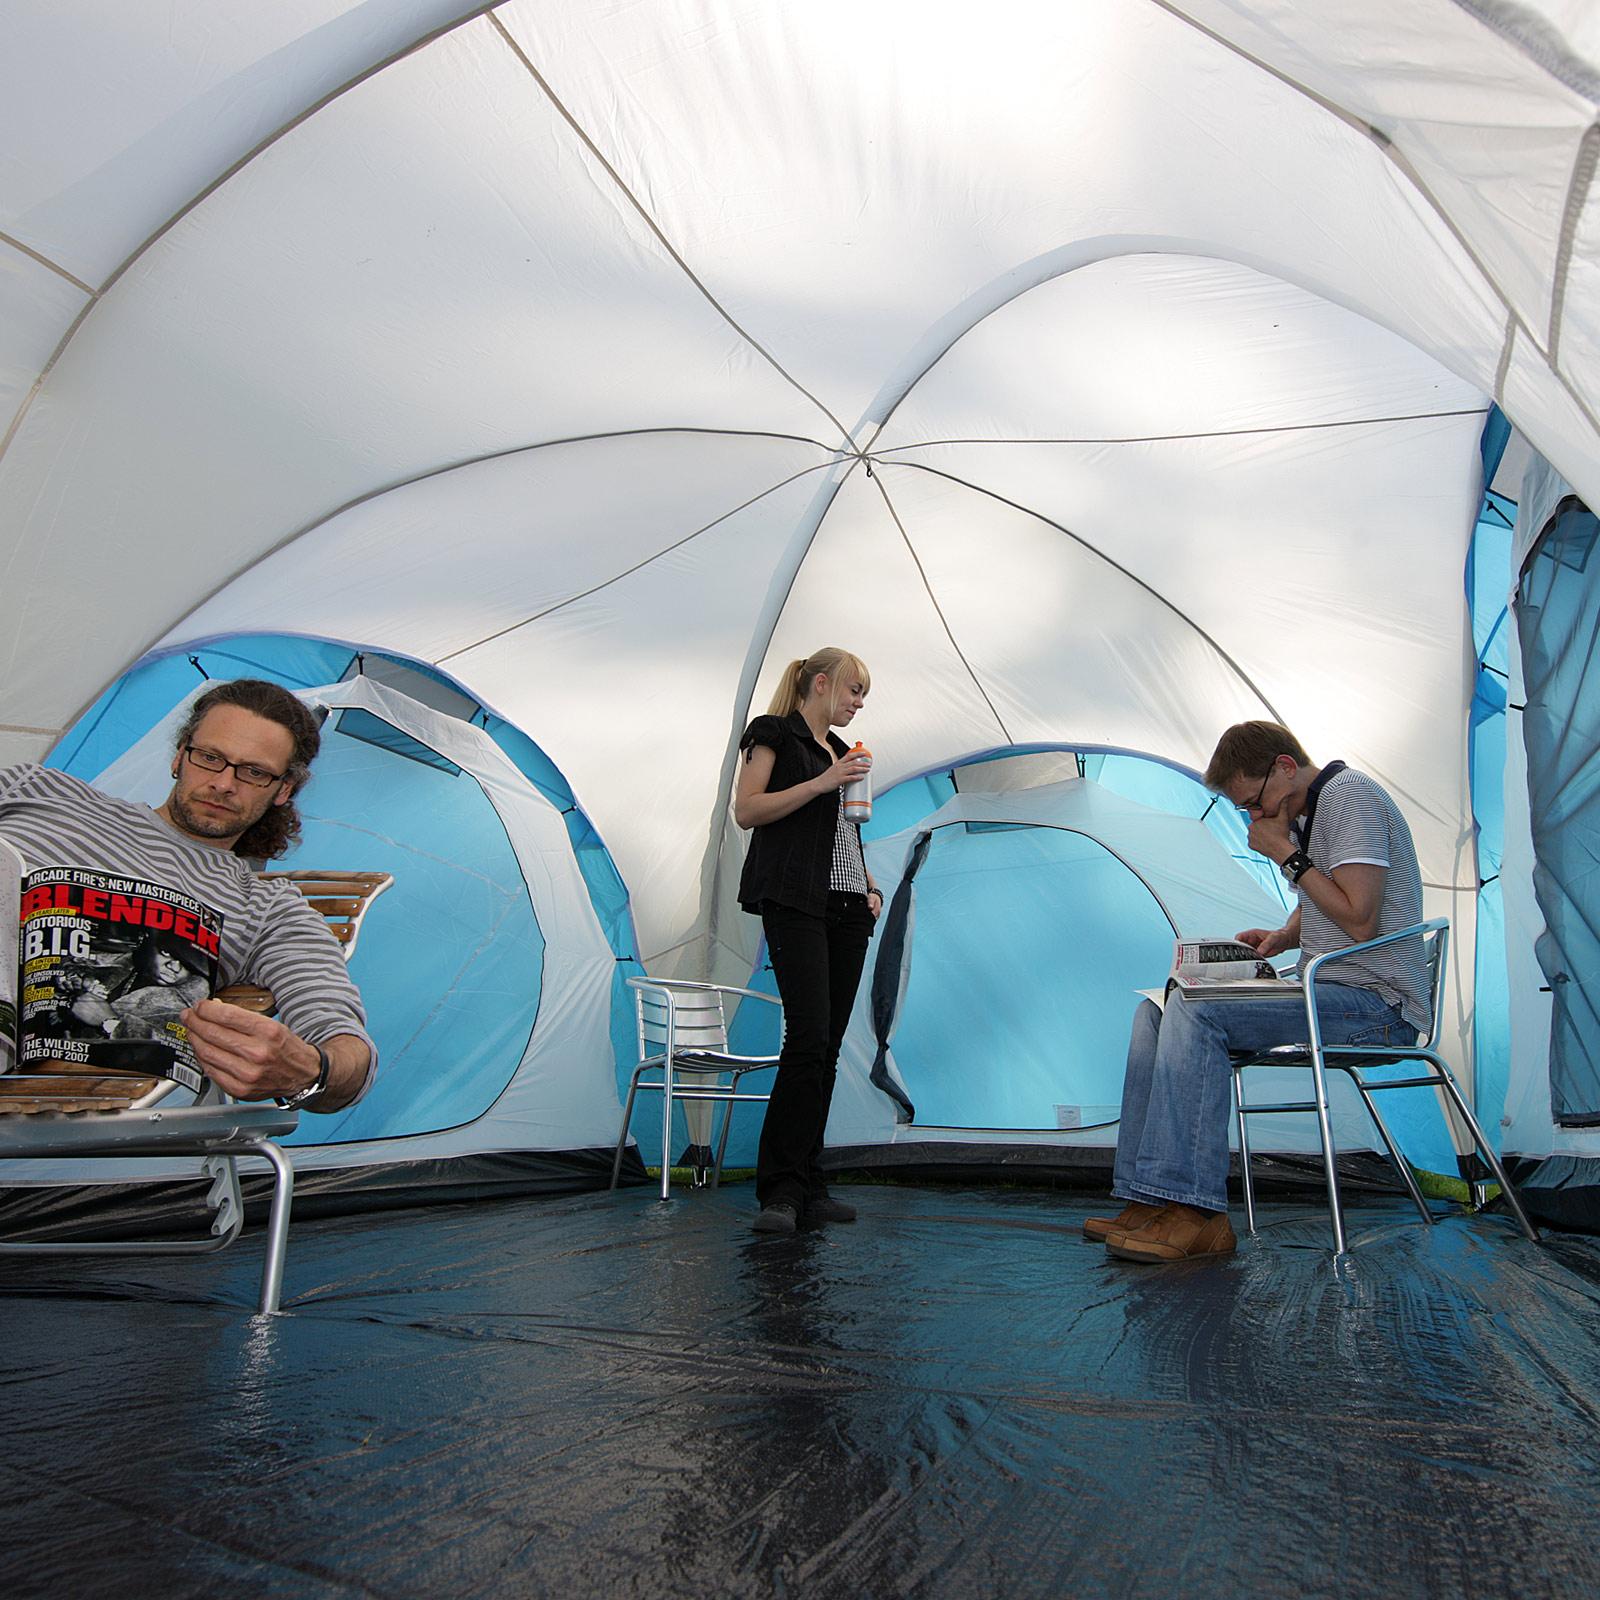 Zelt Kaufen 8 Personen : Skandika toronto personen familienzelt camping zelt uvp